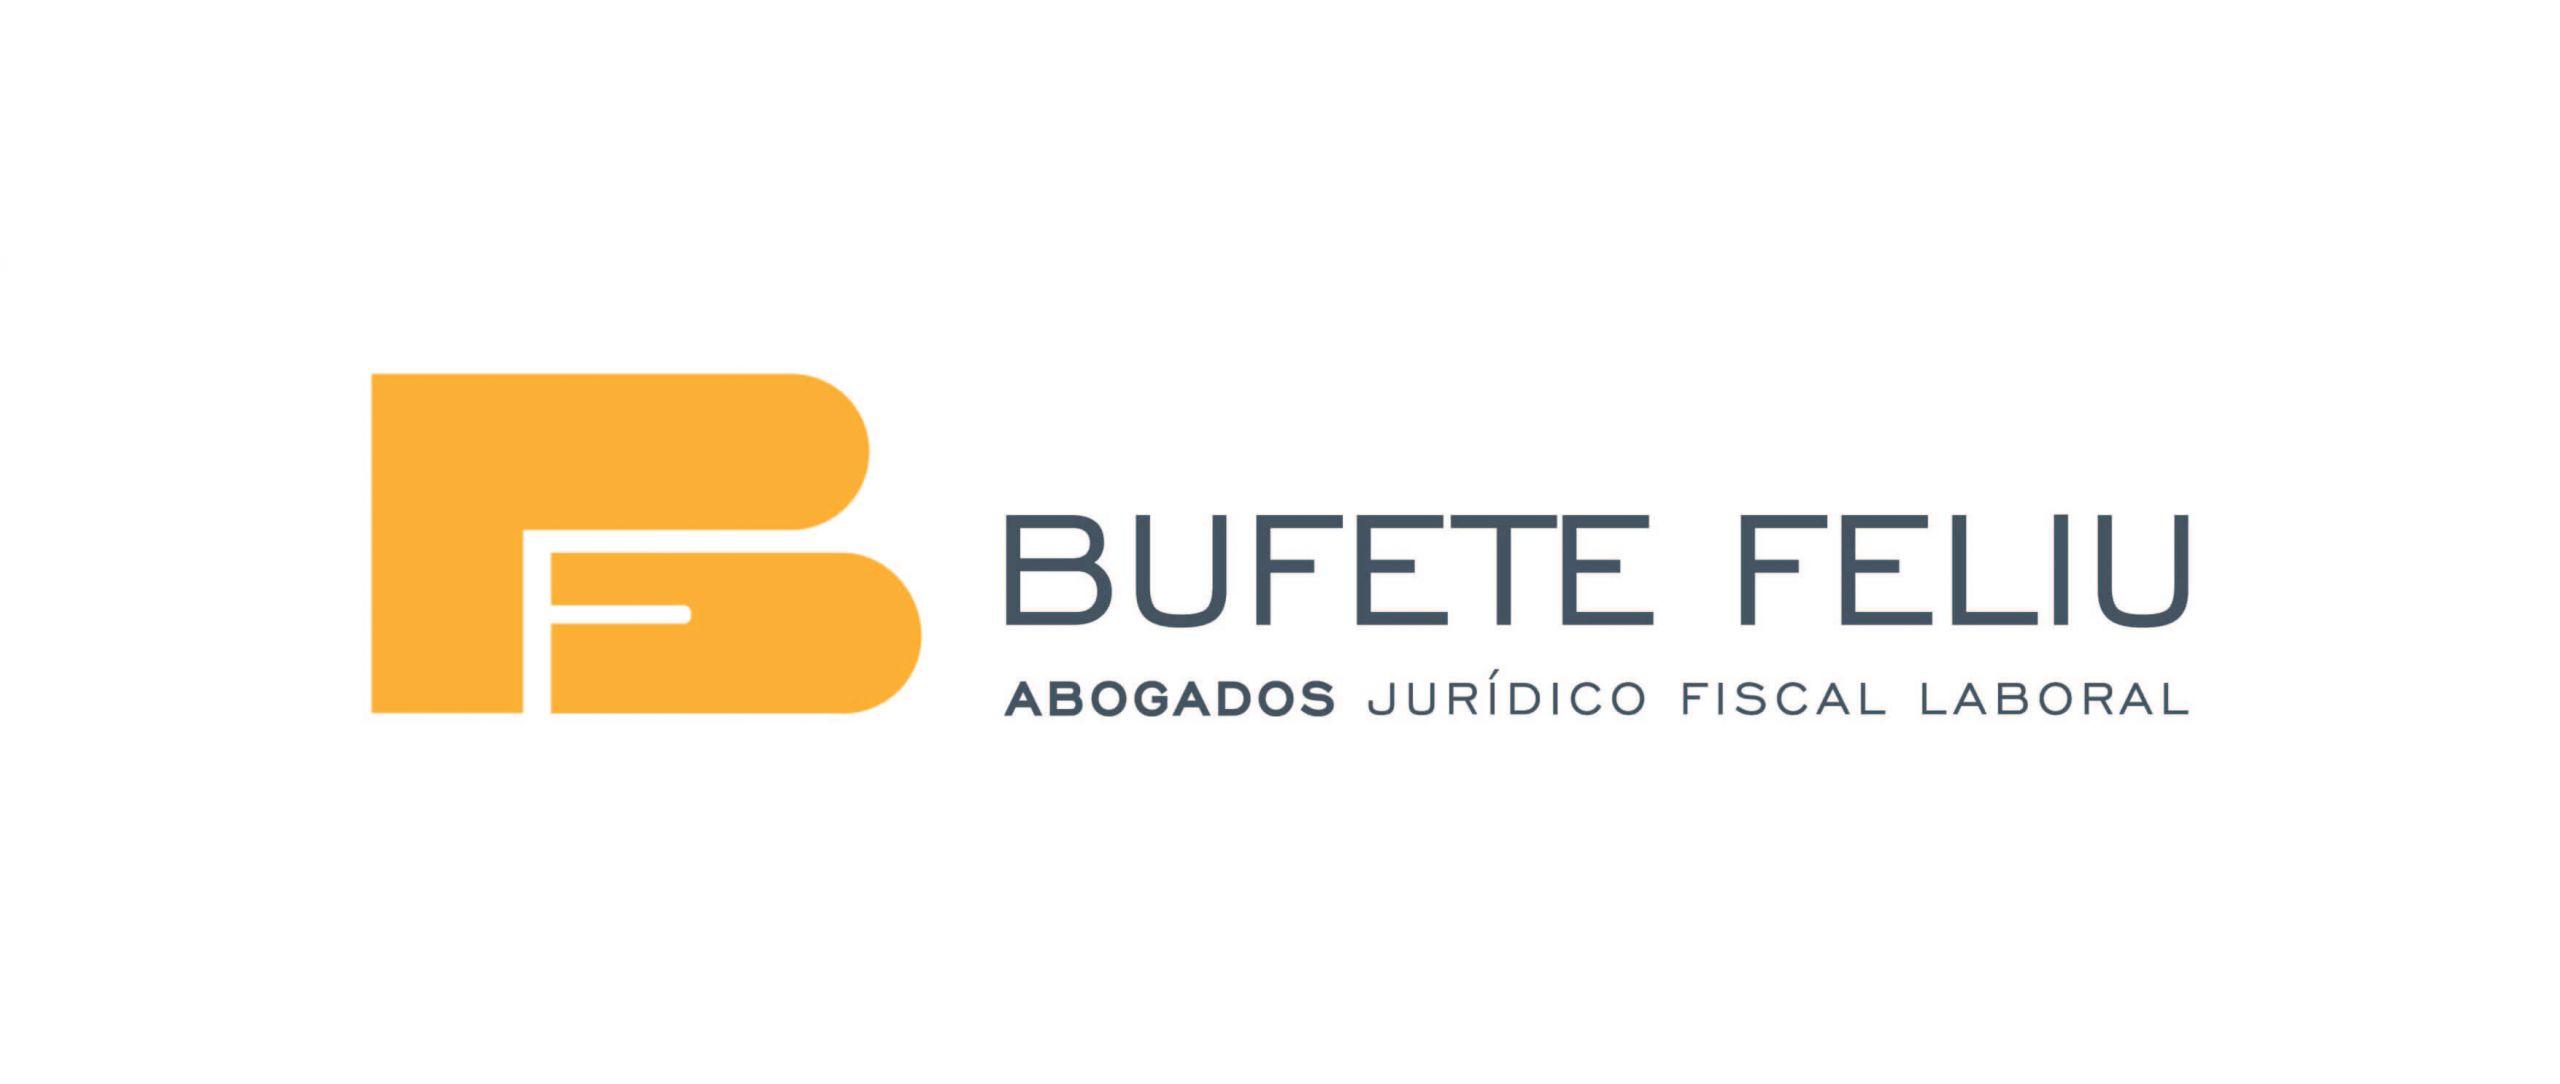 Identidad corporativa - BufeteFeliu